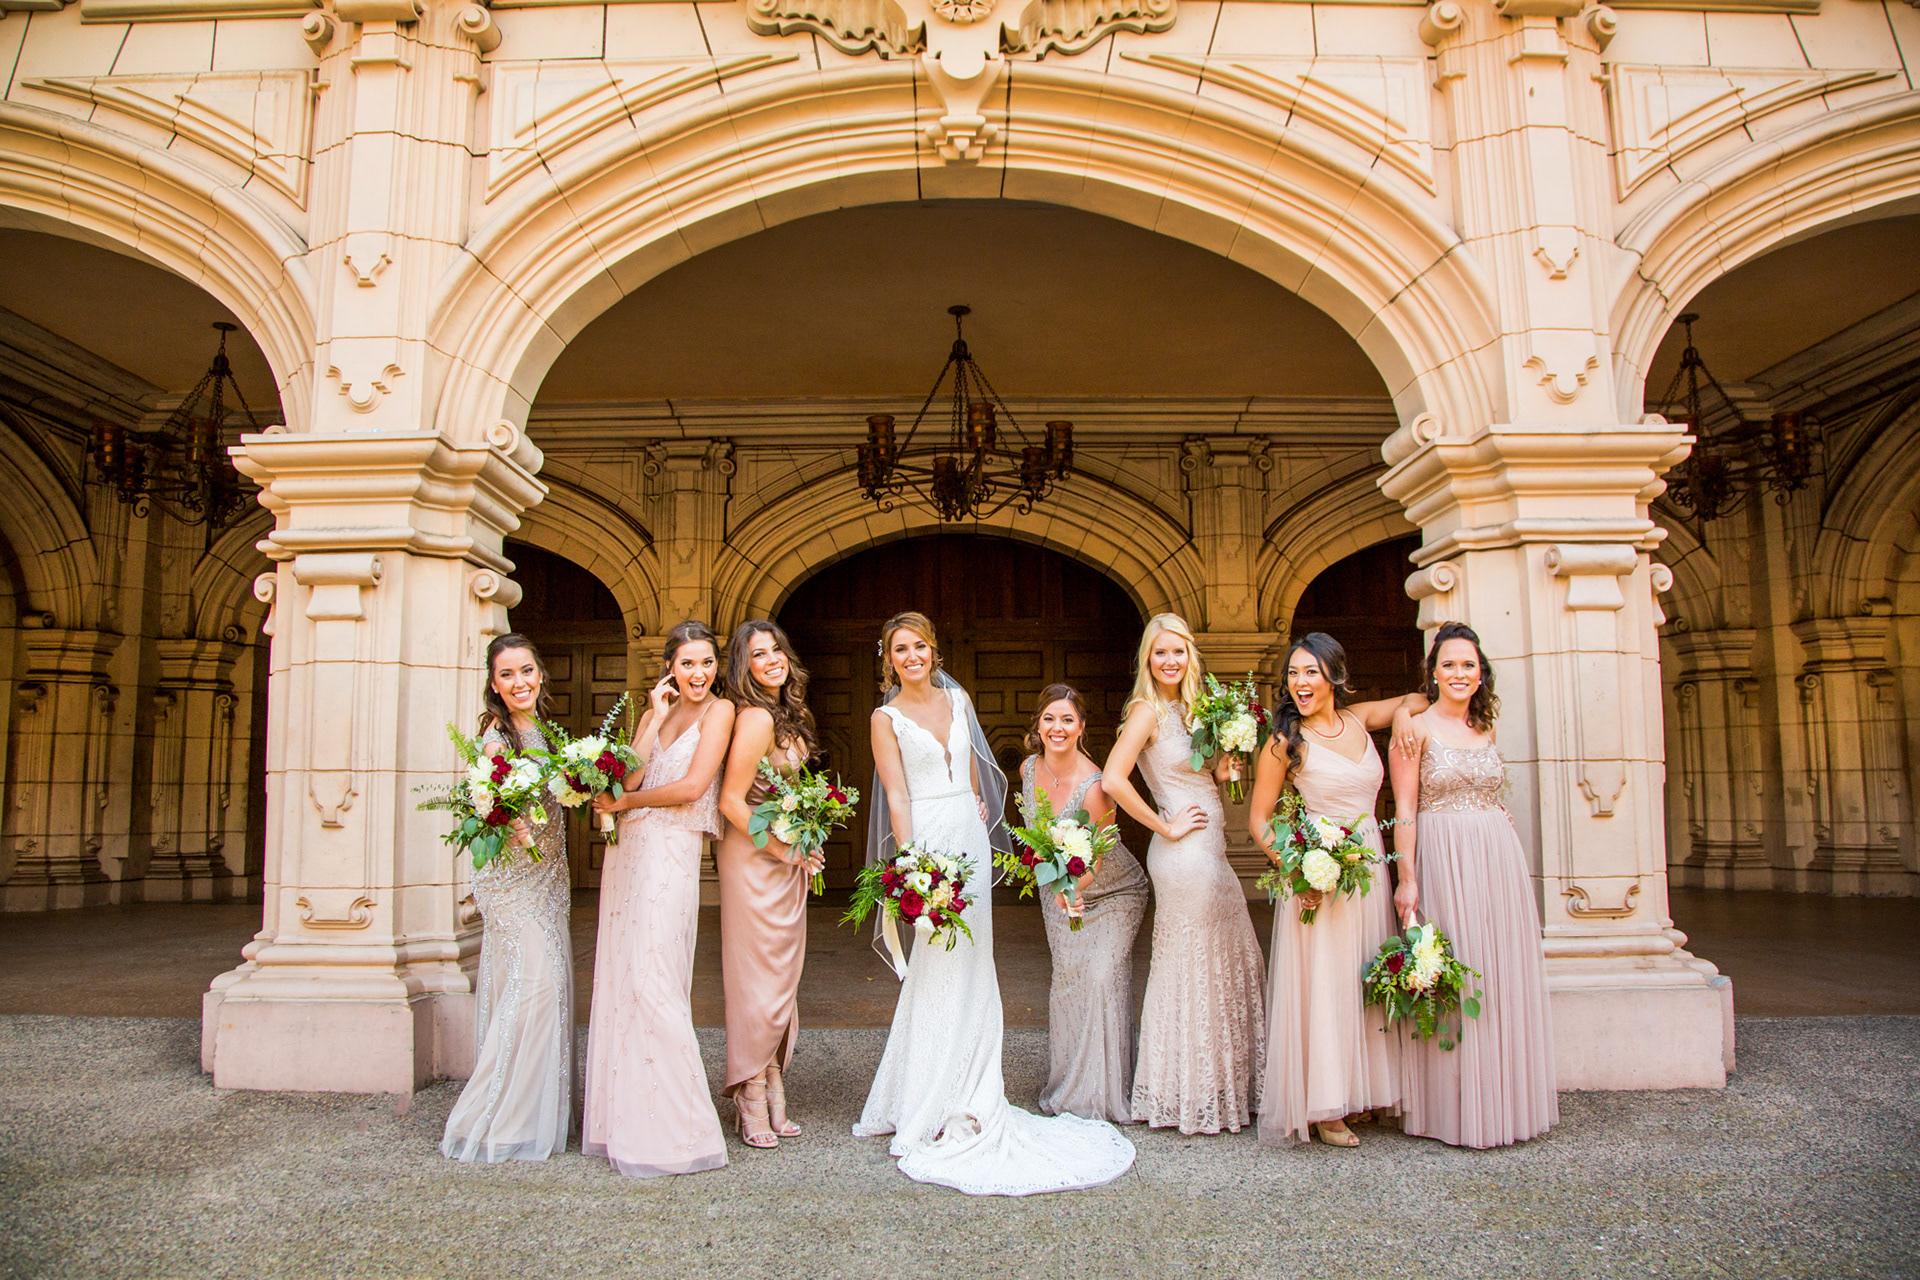 chana groh - Garden and Golf Course Weddings